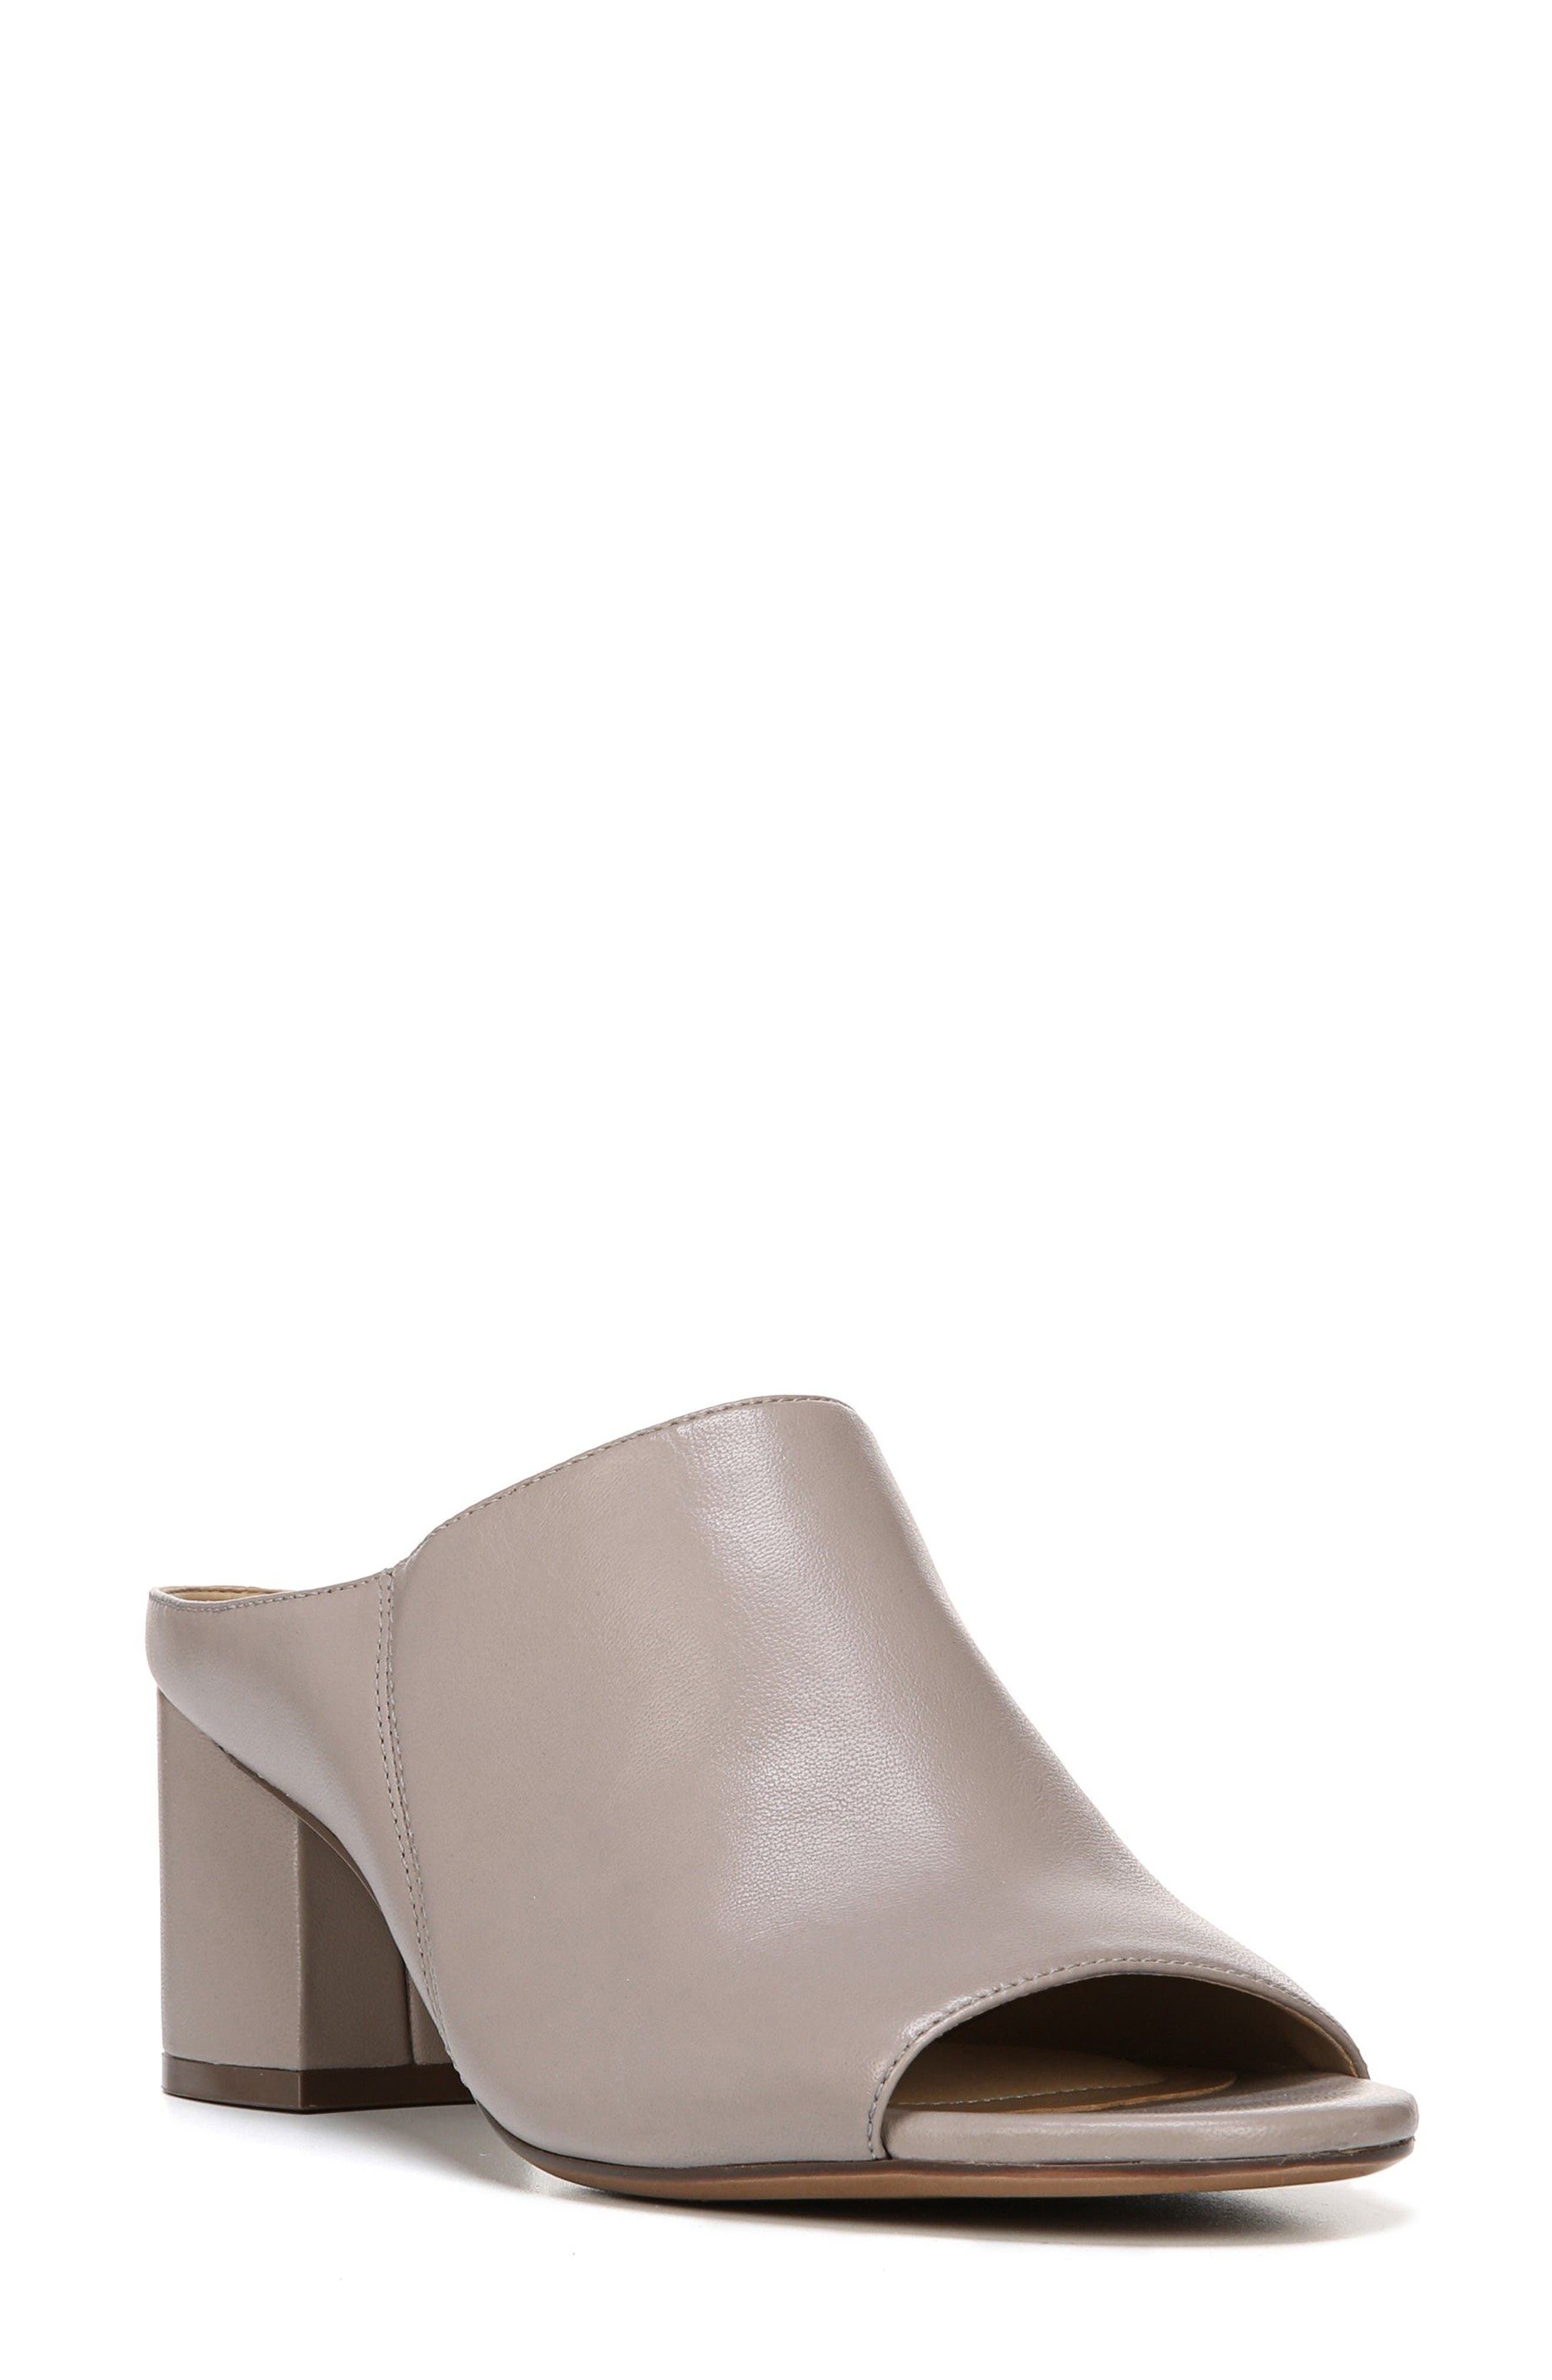 Main Image - Naturalizer Cyprine Slide Sandal (Women)